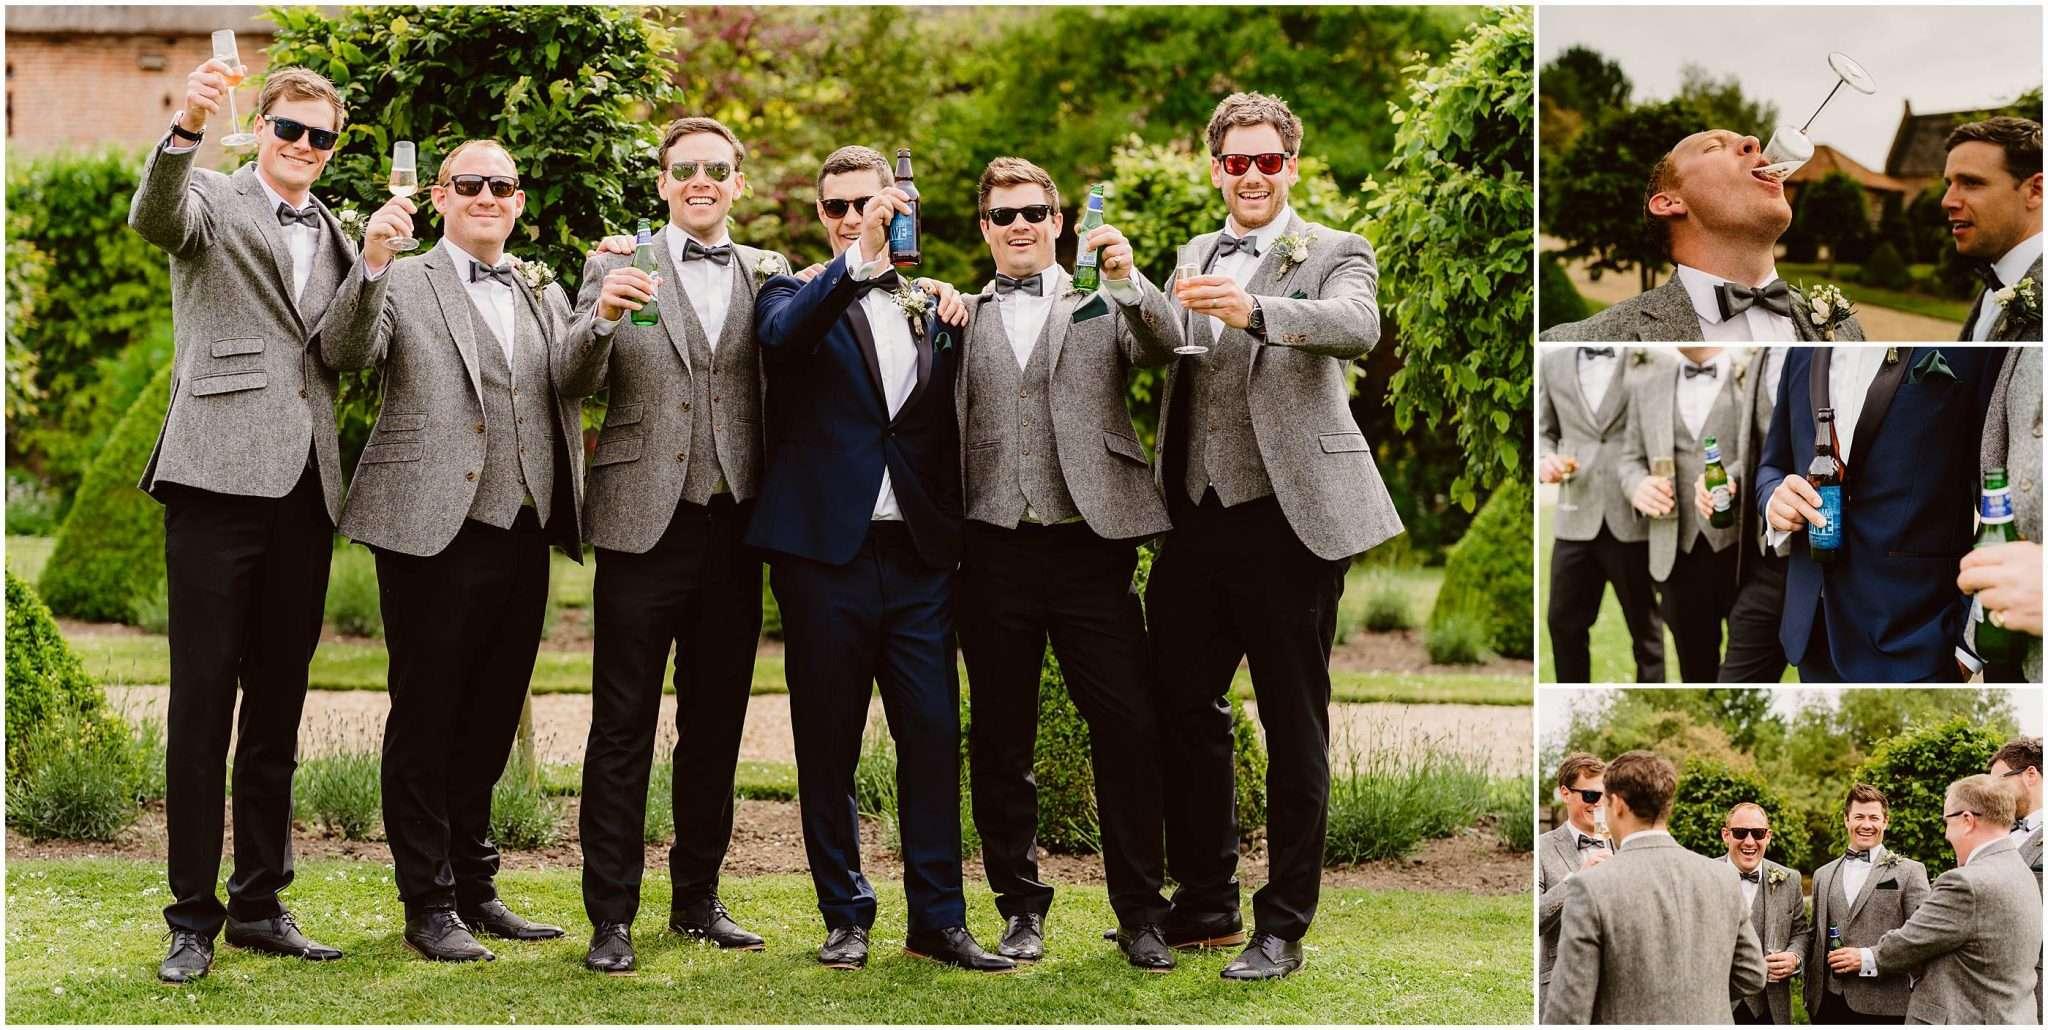 BRONAGH & ADAM'S HALES HALL BARN WEDDING - NORFOLK WEDDING PHOTOGRAPHER